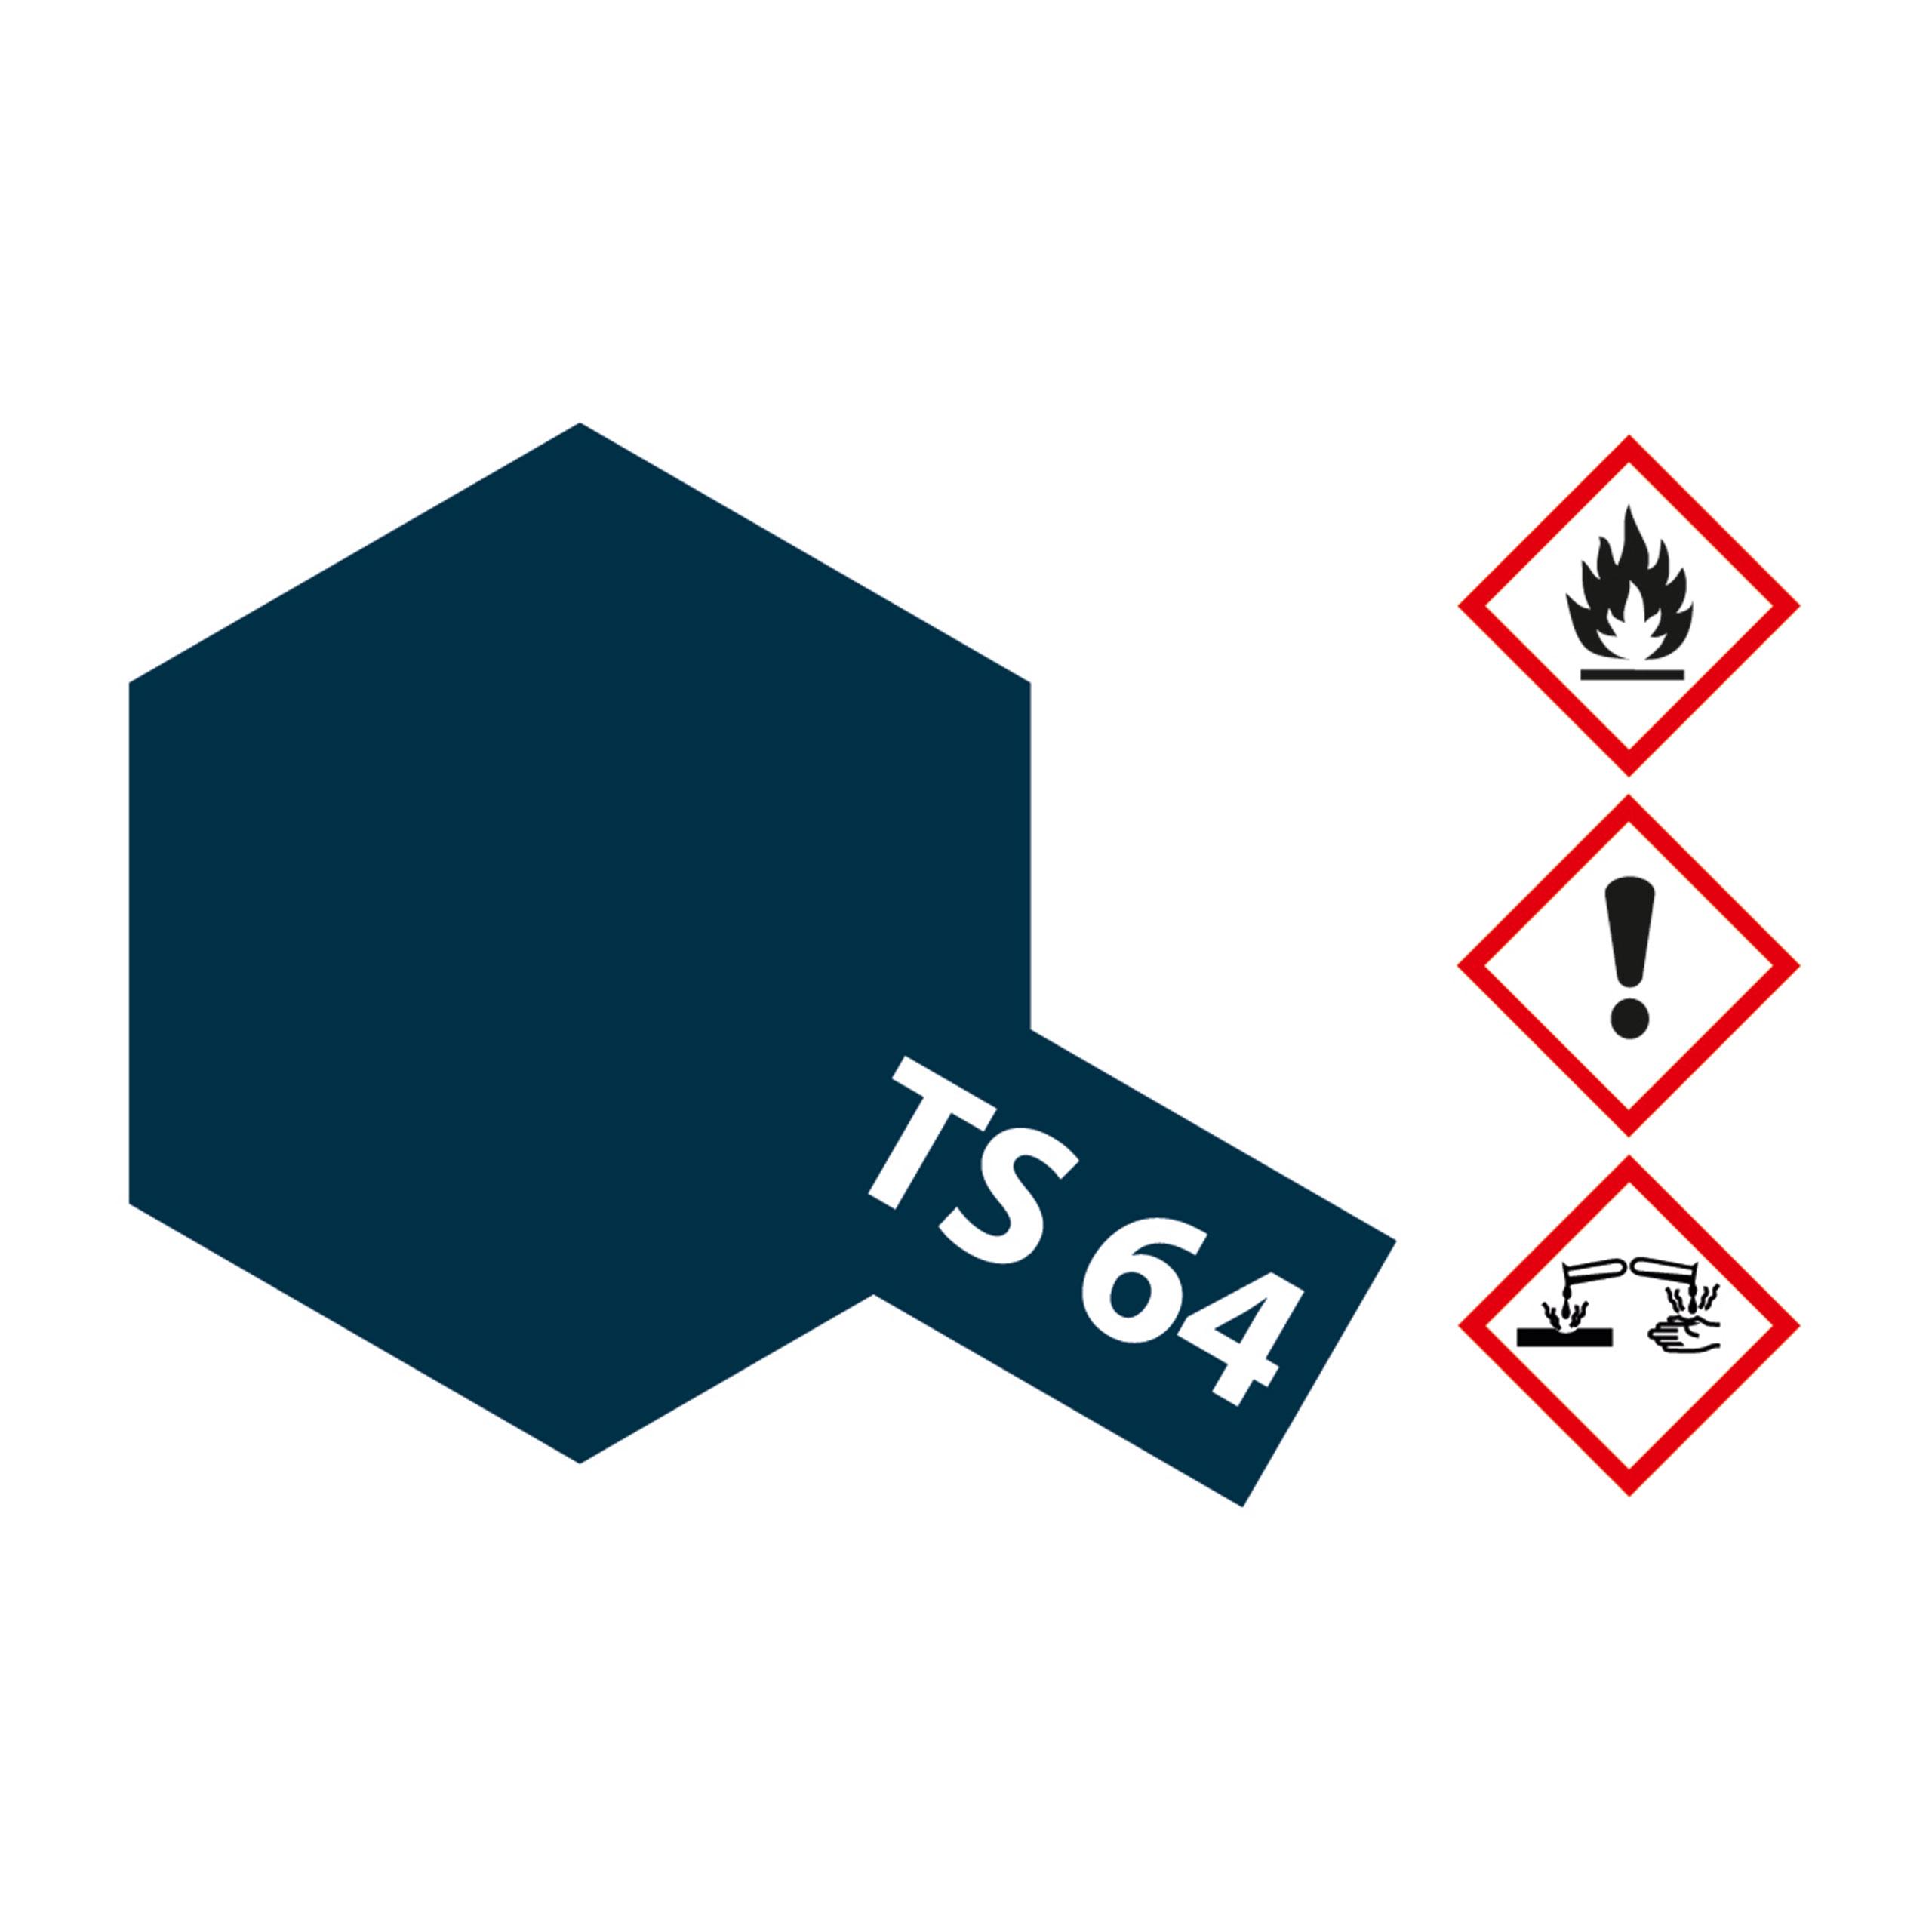 TS-64 Mica Blau dkl. (Glimmer) gl. - 100ml Sprayfarbe Kunstharz Tamiya 300085064